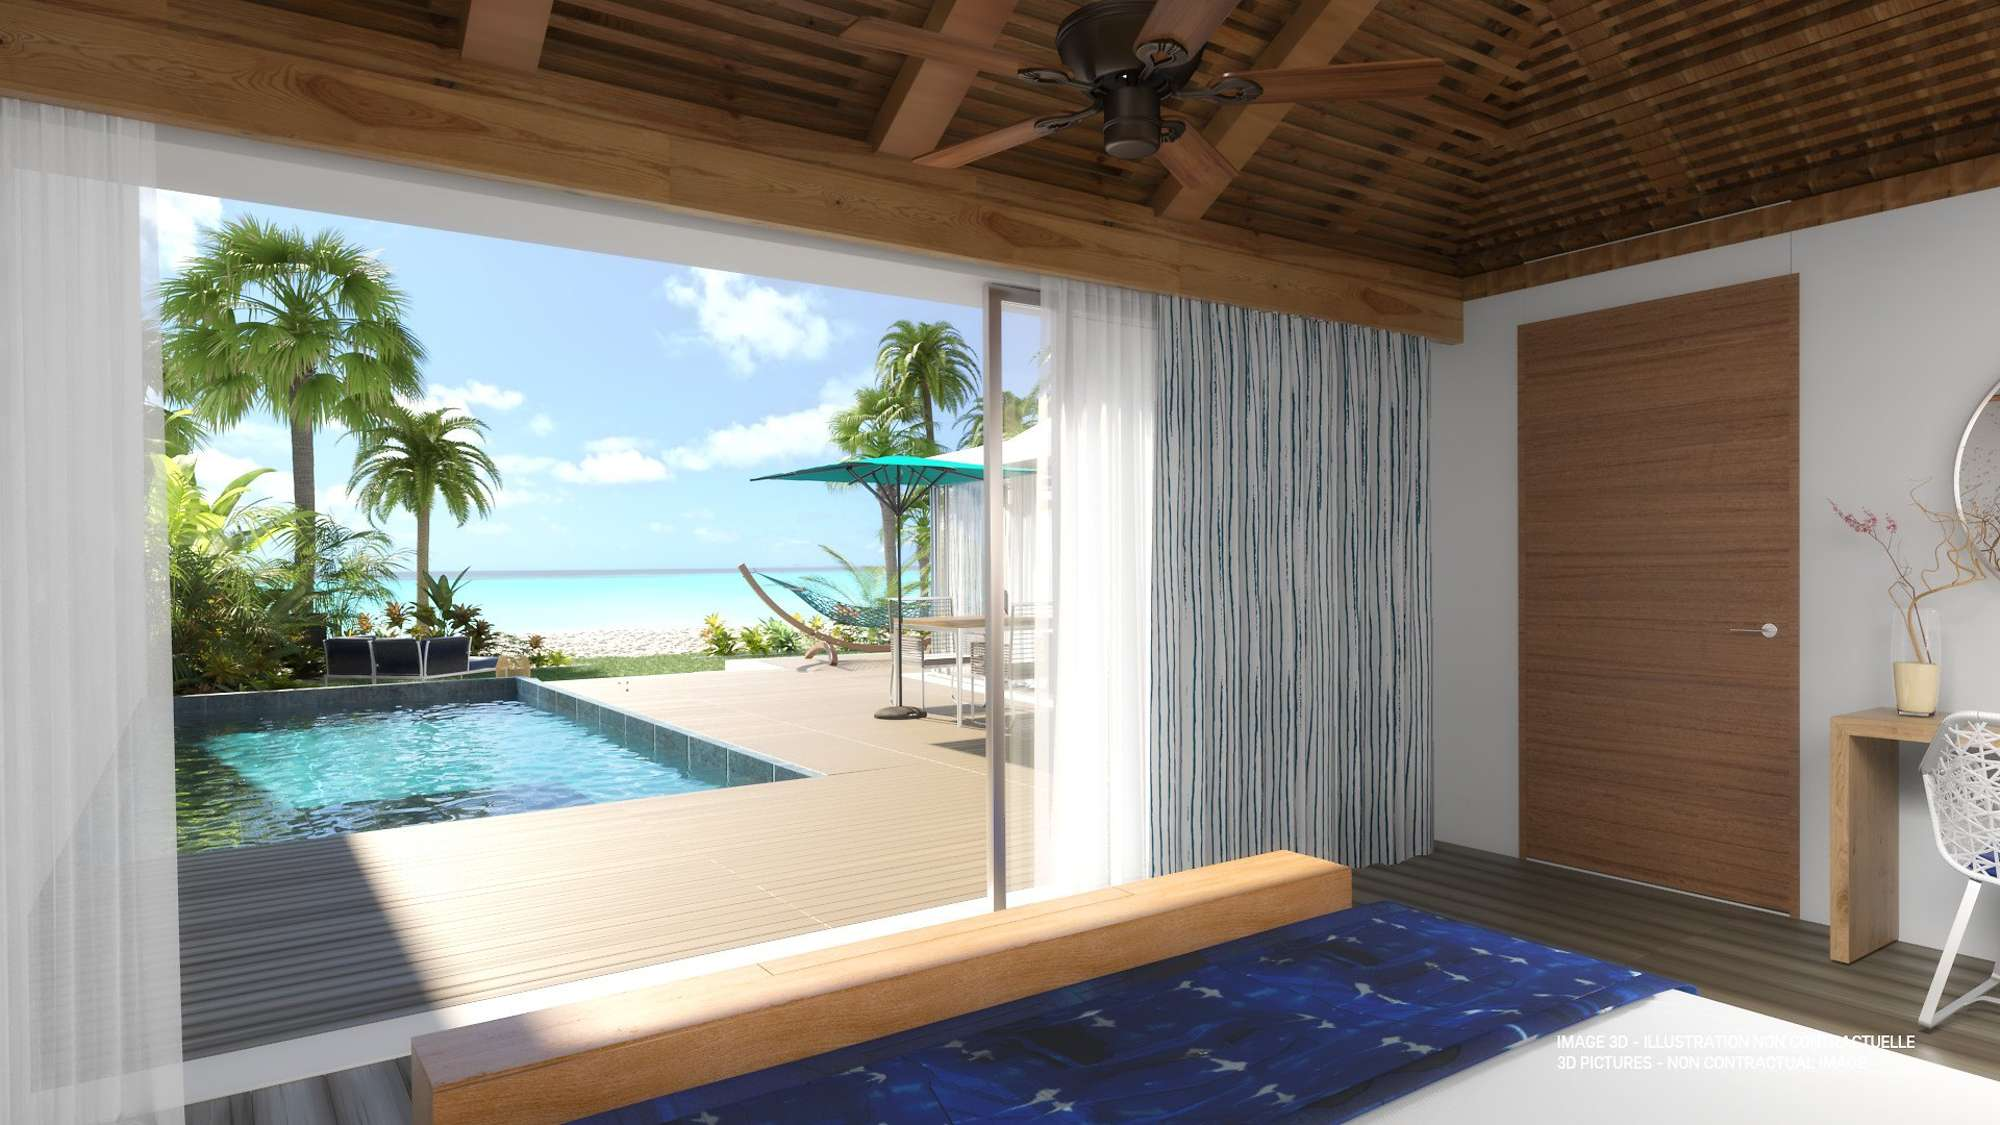 https___ns.clubmed.com_dream_EXCLUSIVE_COLLECTION_Resorts_Miches_Playa_Esmeralda_182722-monpupmfop-swhr